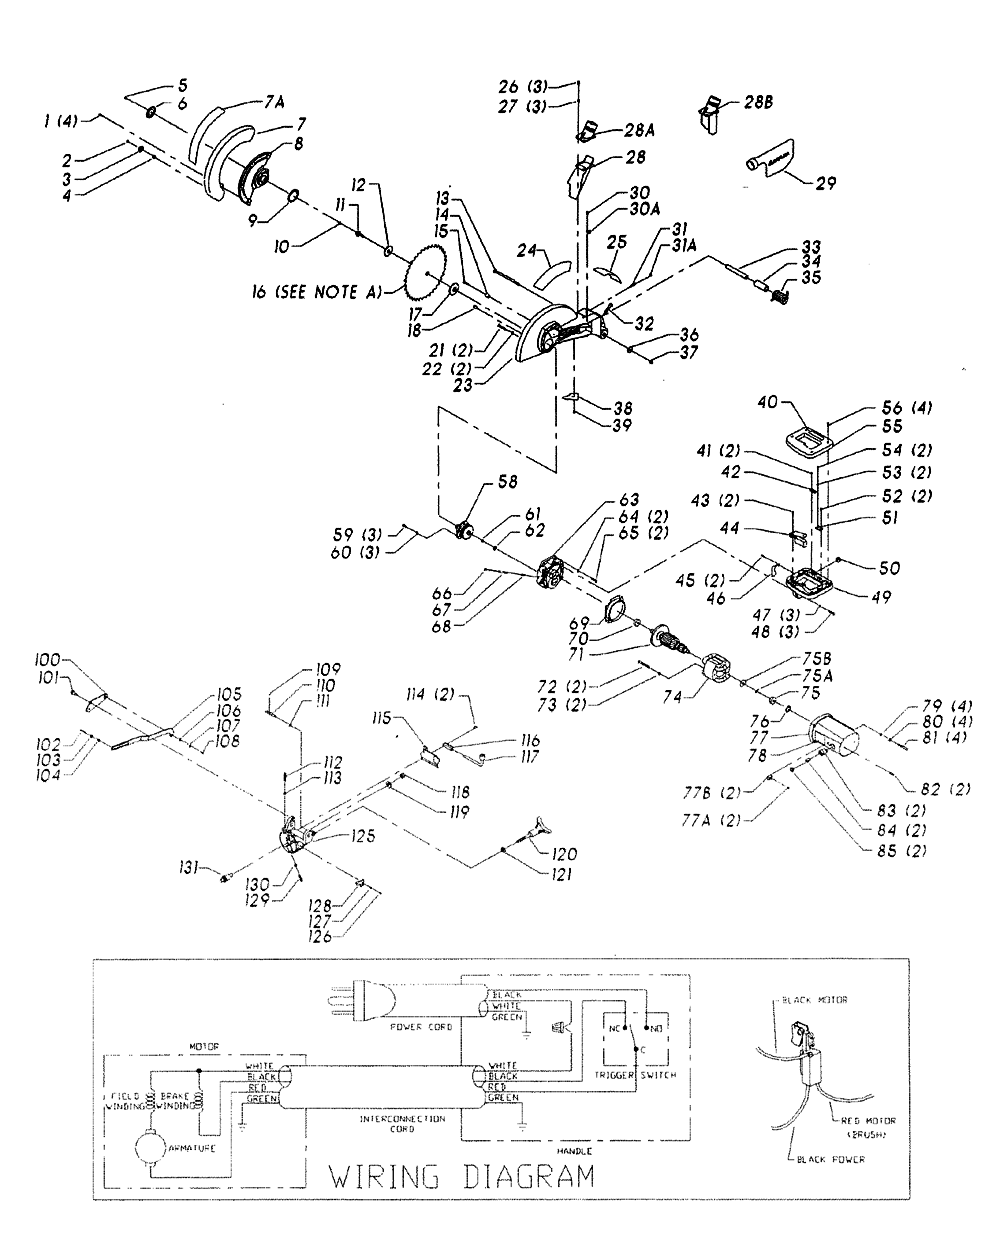 John Deere 235 Wiring DiagramDeereWiring Diagram Images Database – John Deere Wire Diagram 060000